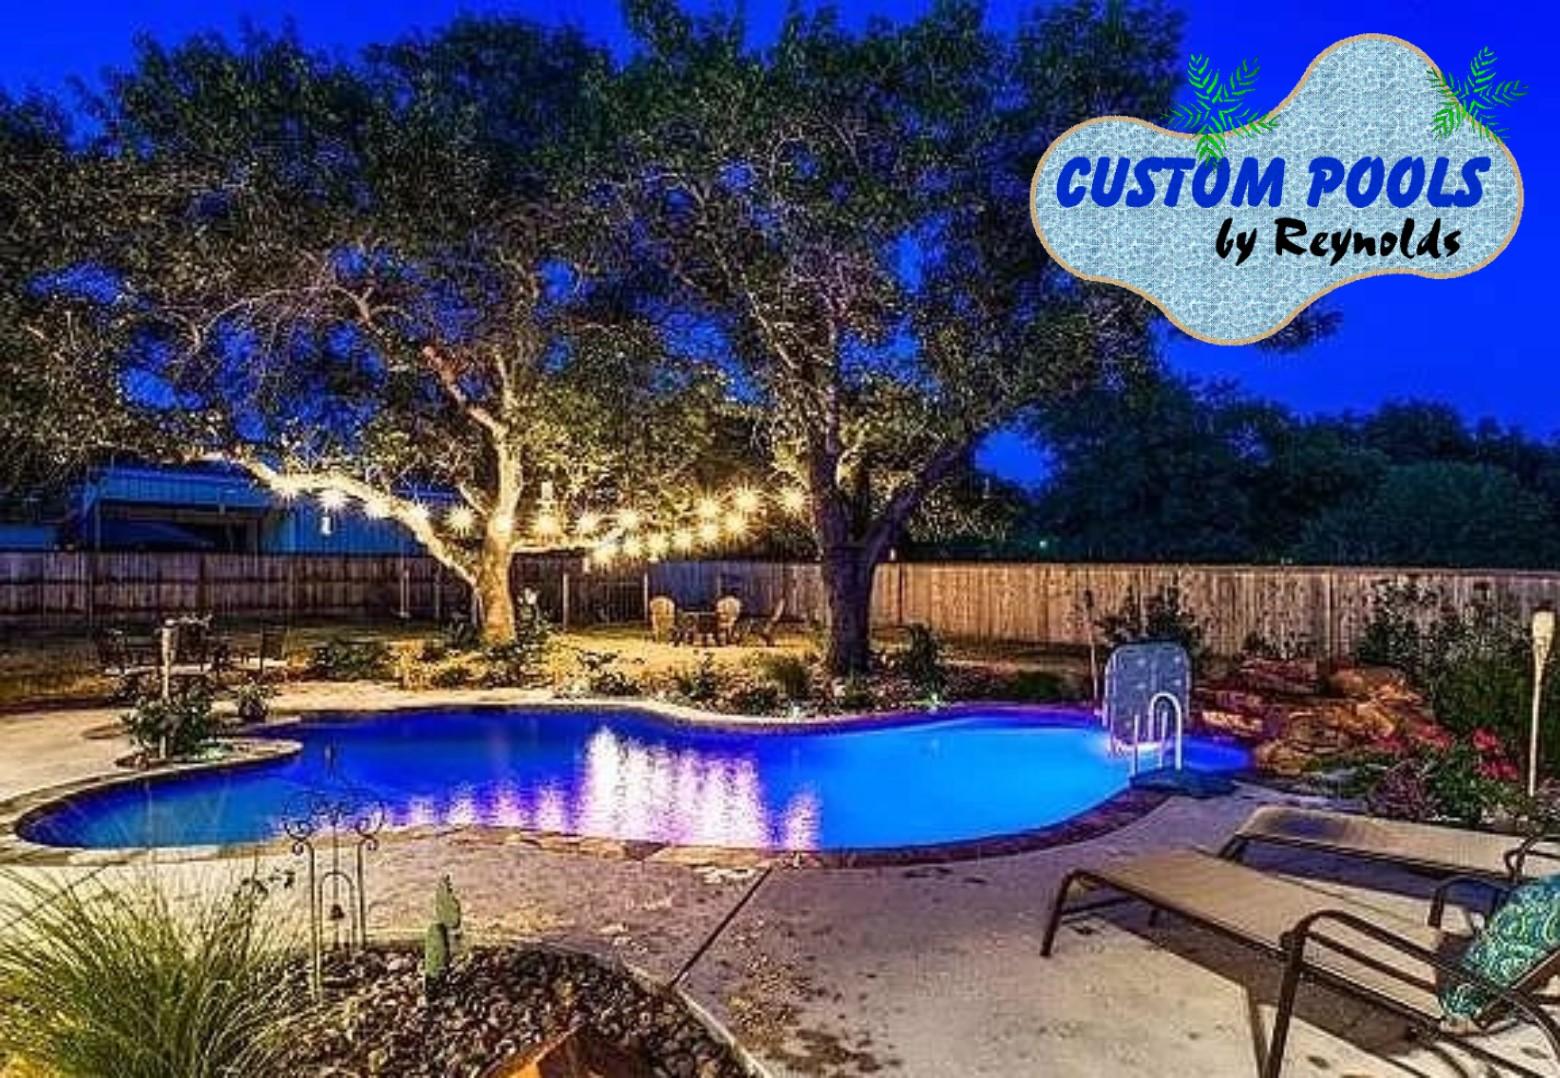 Custom Pools by Reynolds